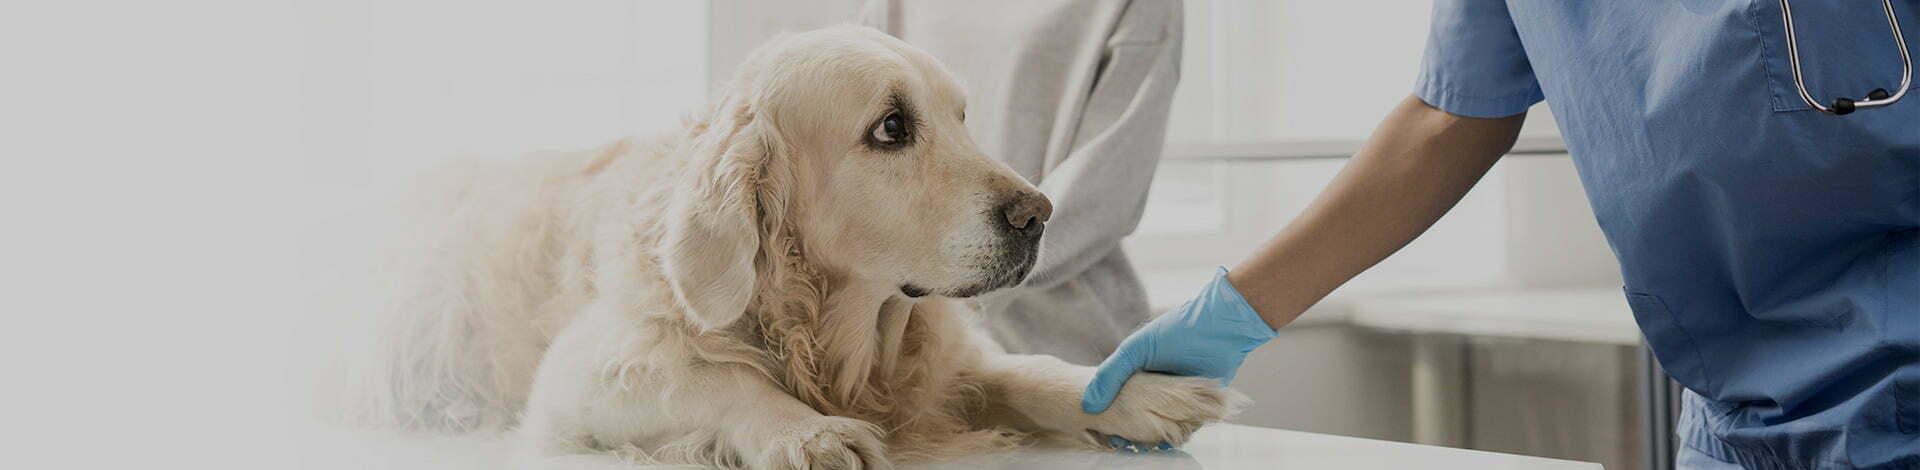 easyvet veterinarian performing sick pet exam on a dog